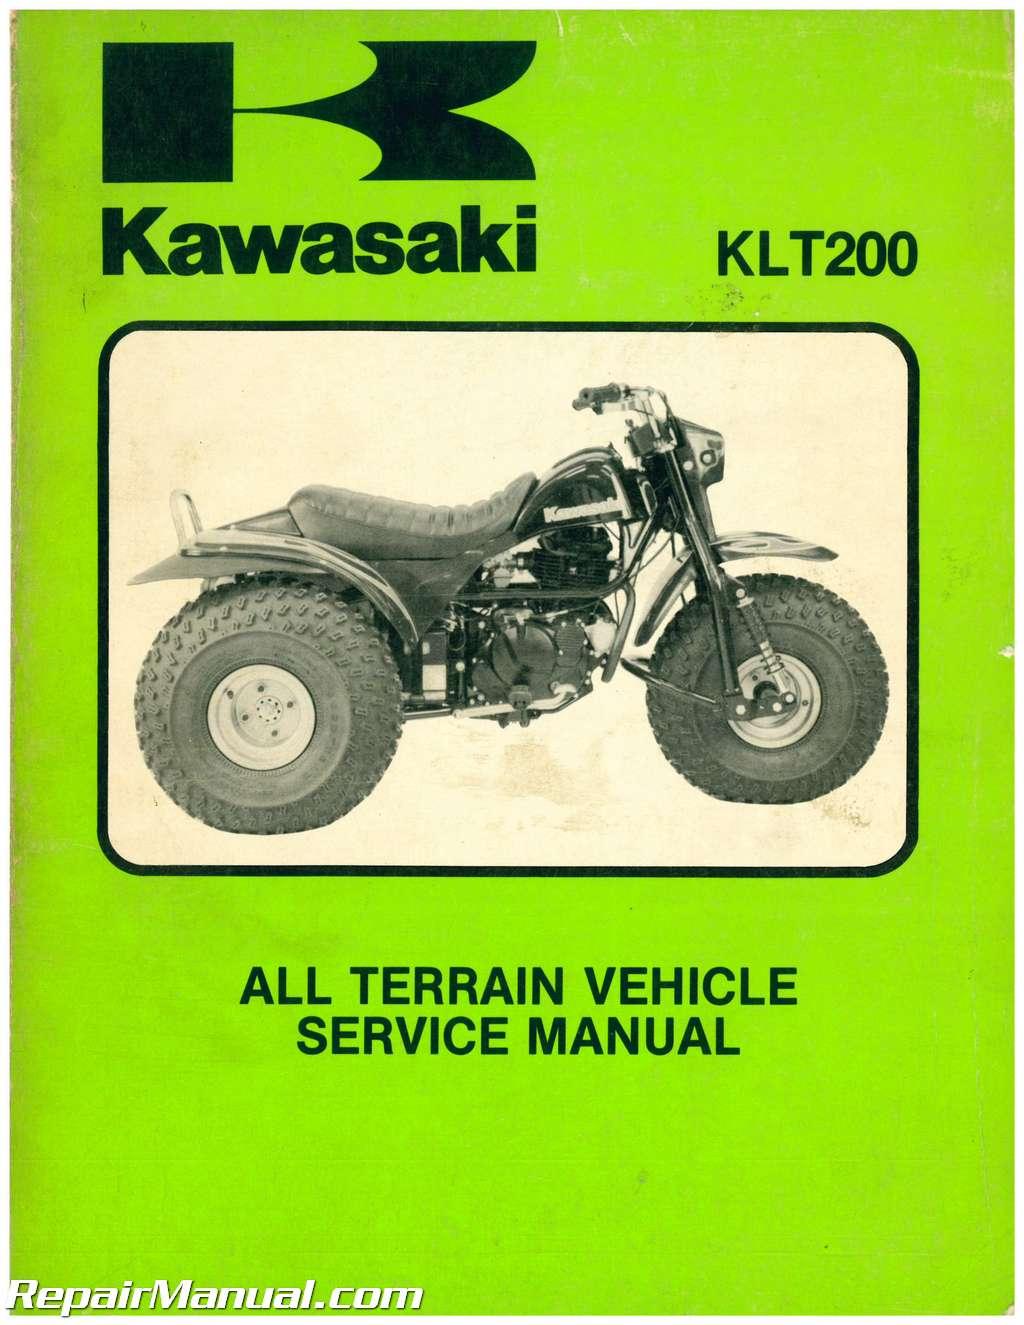 hight resolution of 1983 kawasaki klt200 atc three wheeler service manual kawasaki klt 200 wiring diagram